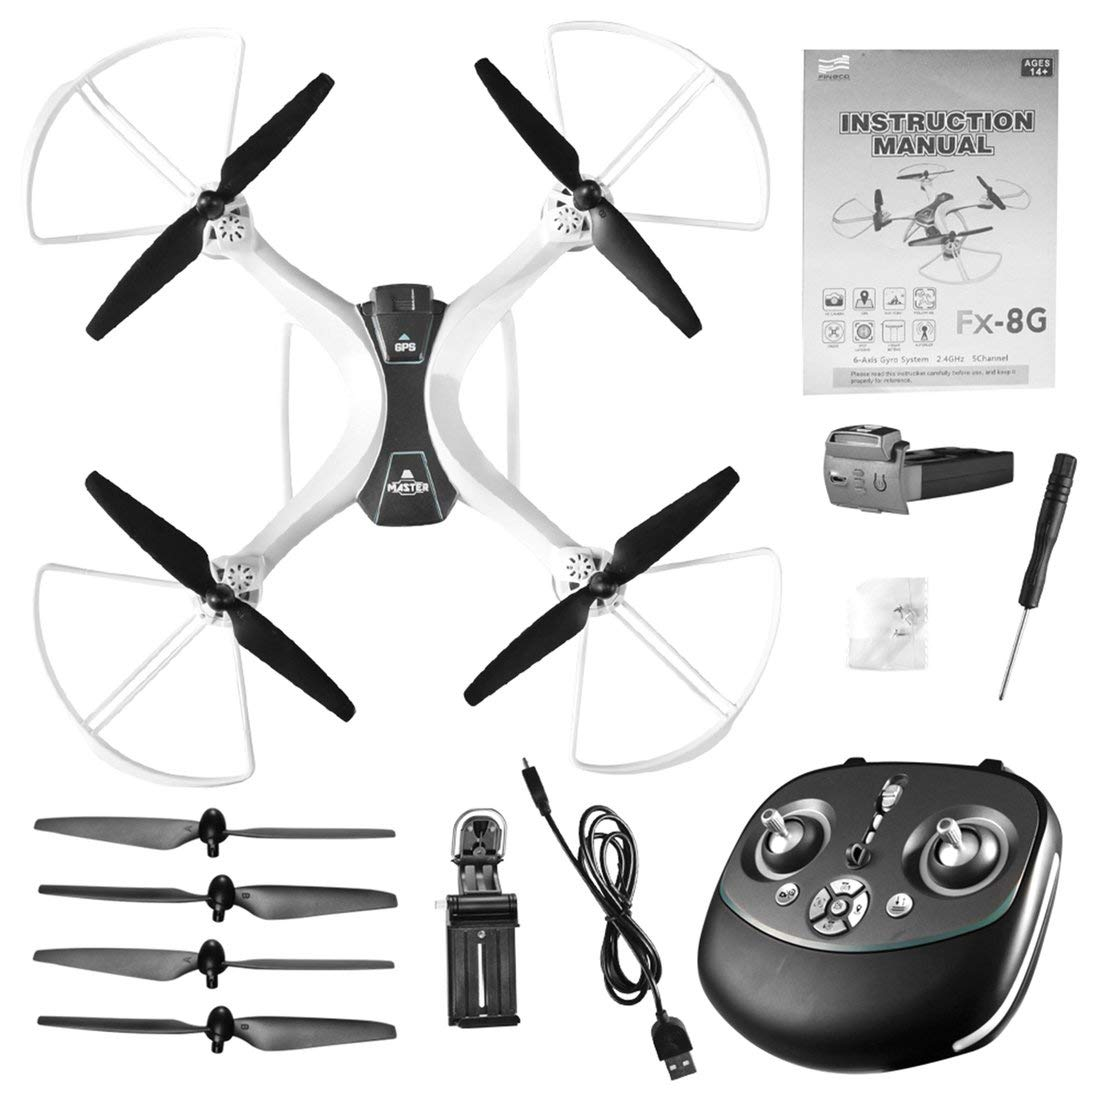 Reducción de precio Formulaone FX-8G 6-Axis WiFi FPV Drone con cámara HD Sígueme Onekey Return Altitude Hold Modo sin Cabeza GPS Quadcopter Blanco y Negro